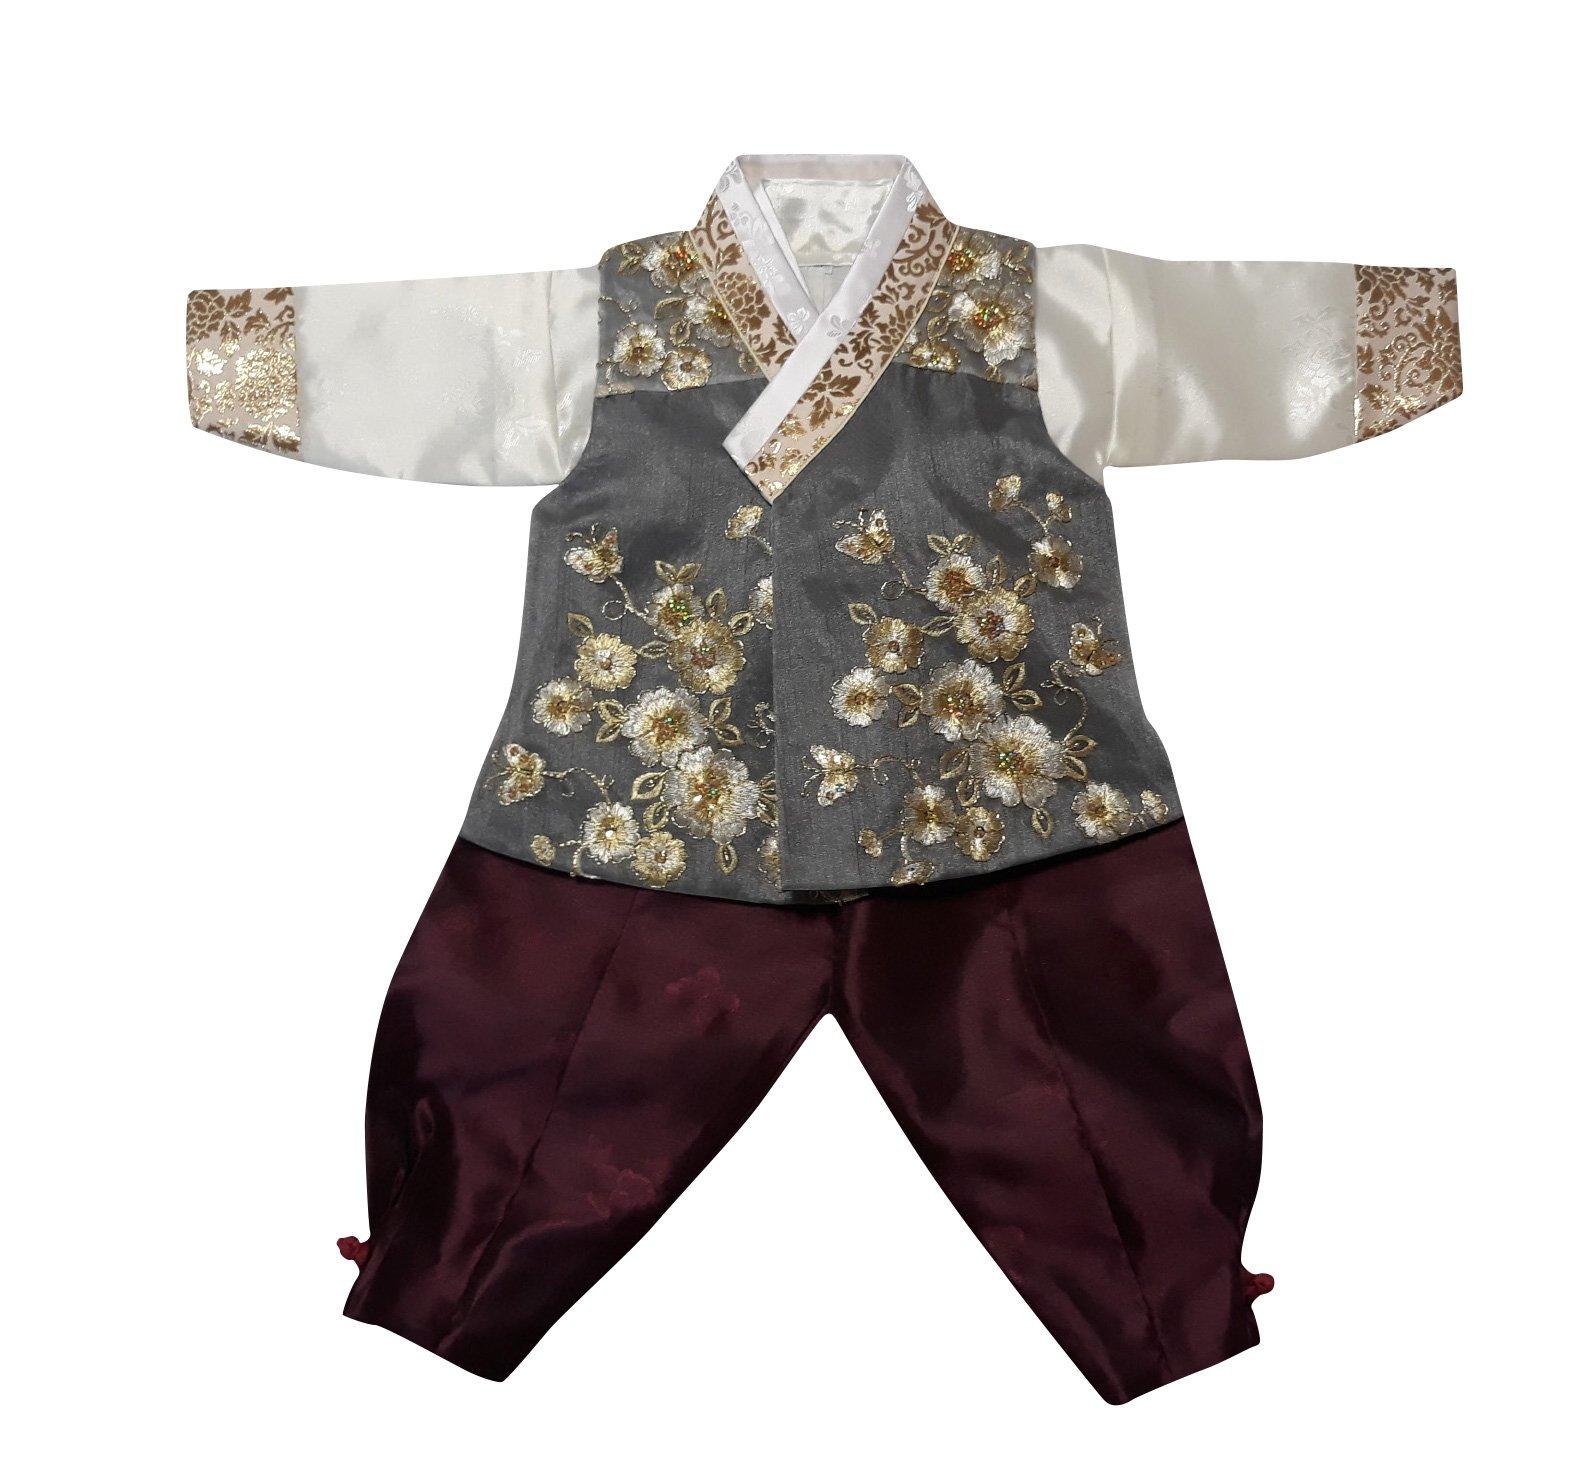 Hanbok Korea Traditional Costumes Boys Babies Kids Party Birthday Ceremony DOLBOK ba109boy (1 age)